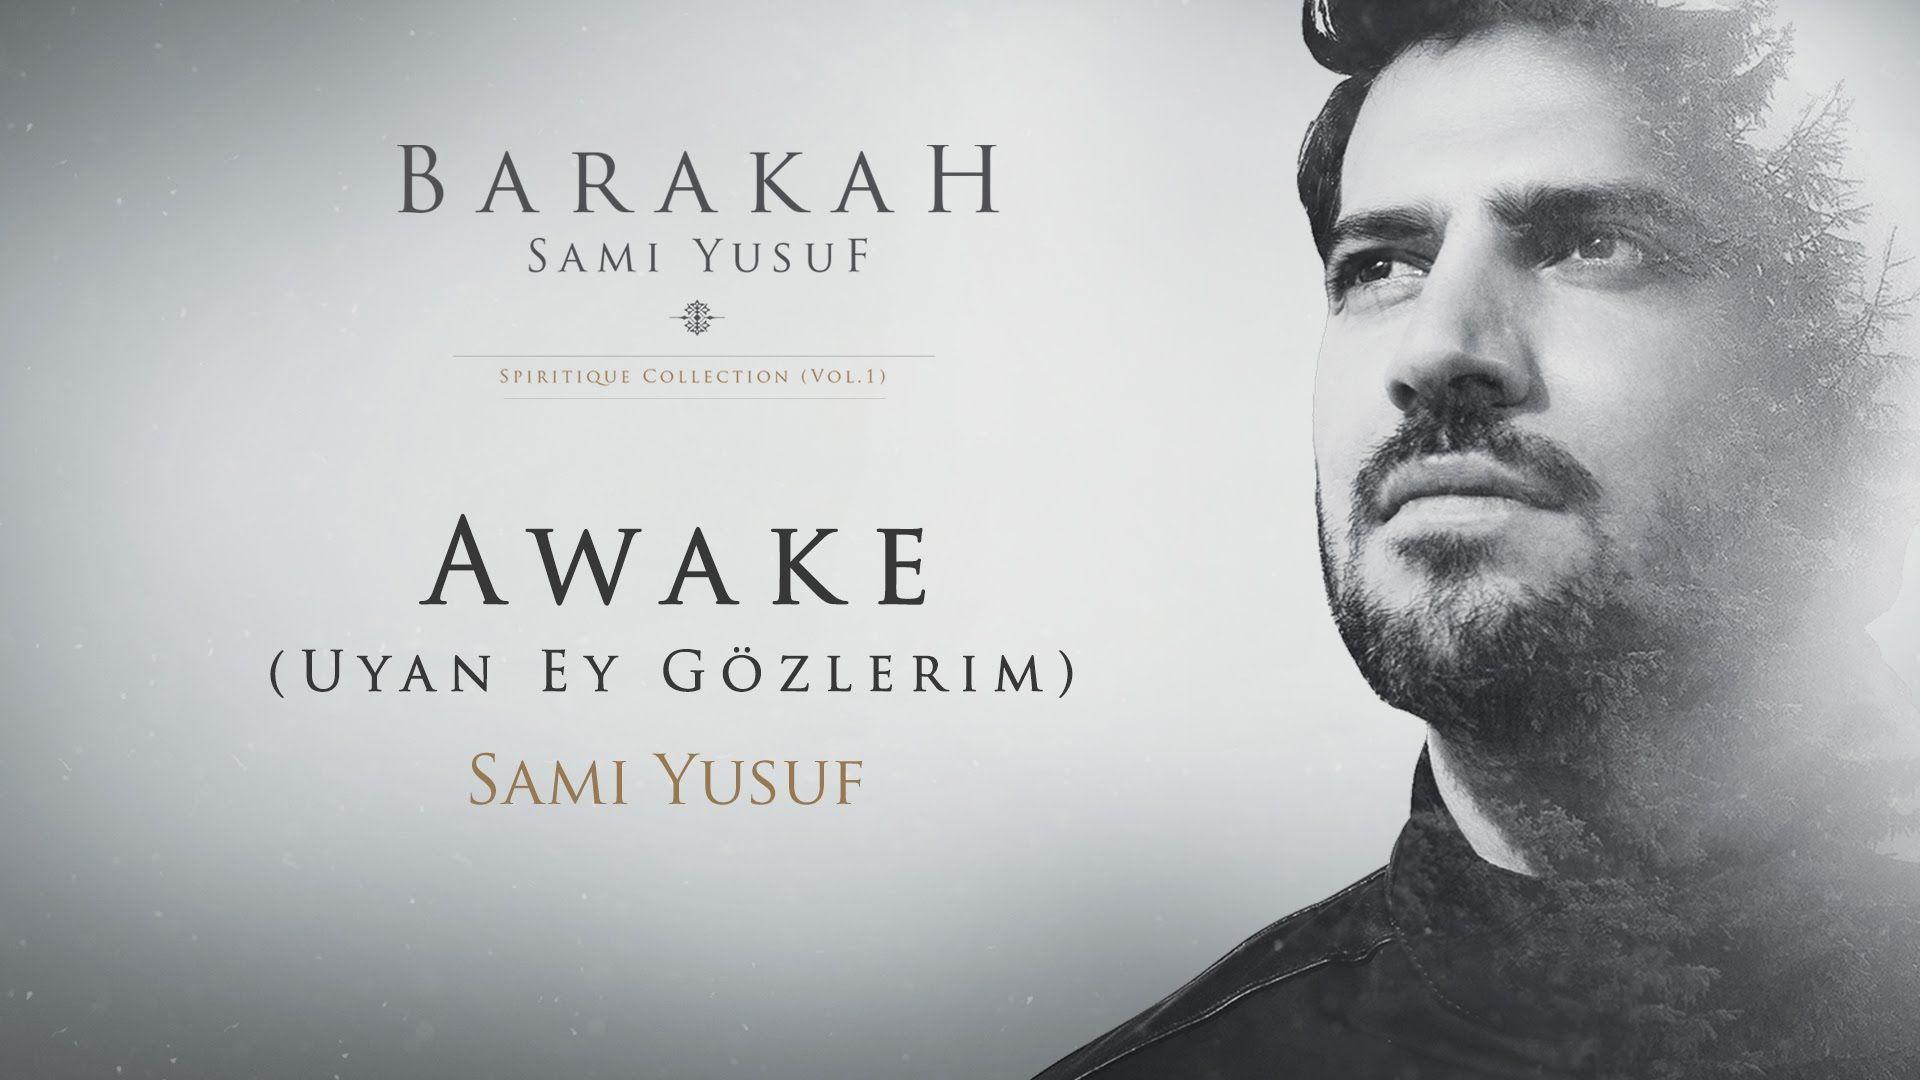 Sami Yusuf Awake Uyan Ey Gozlerim Official Audio Sami Islamic Music Islamic Nasheed